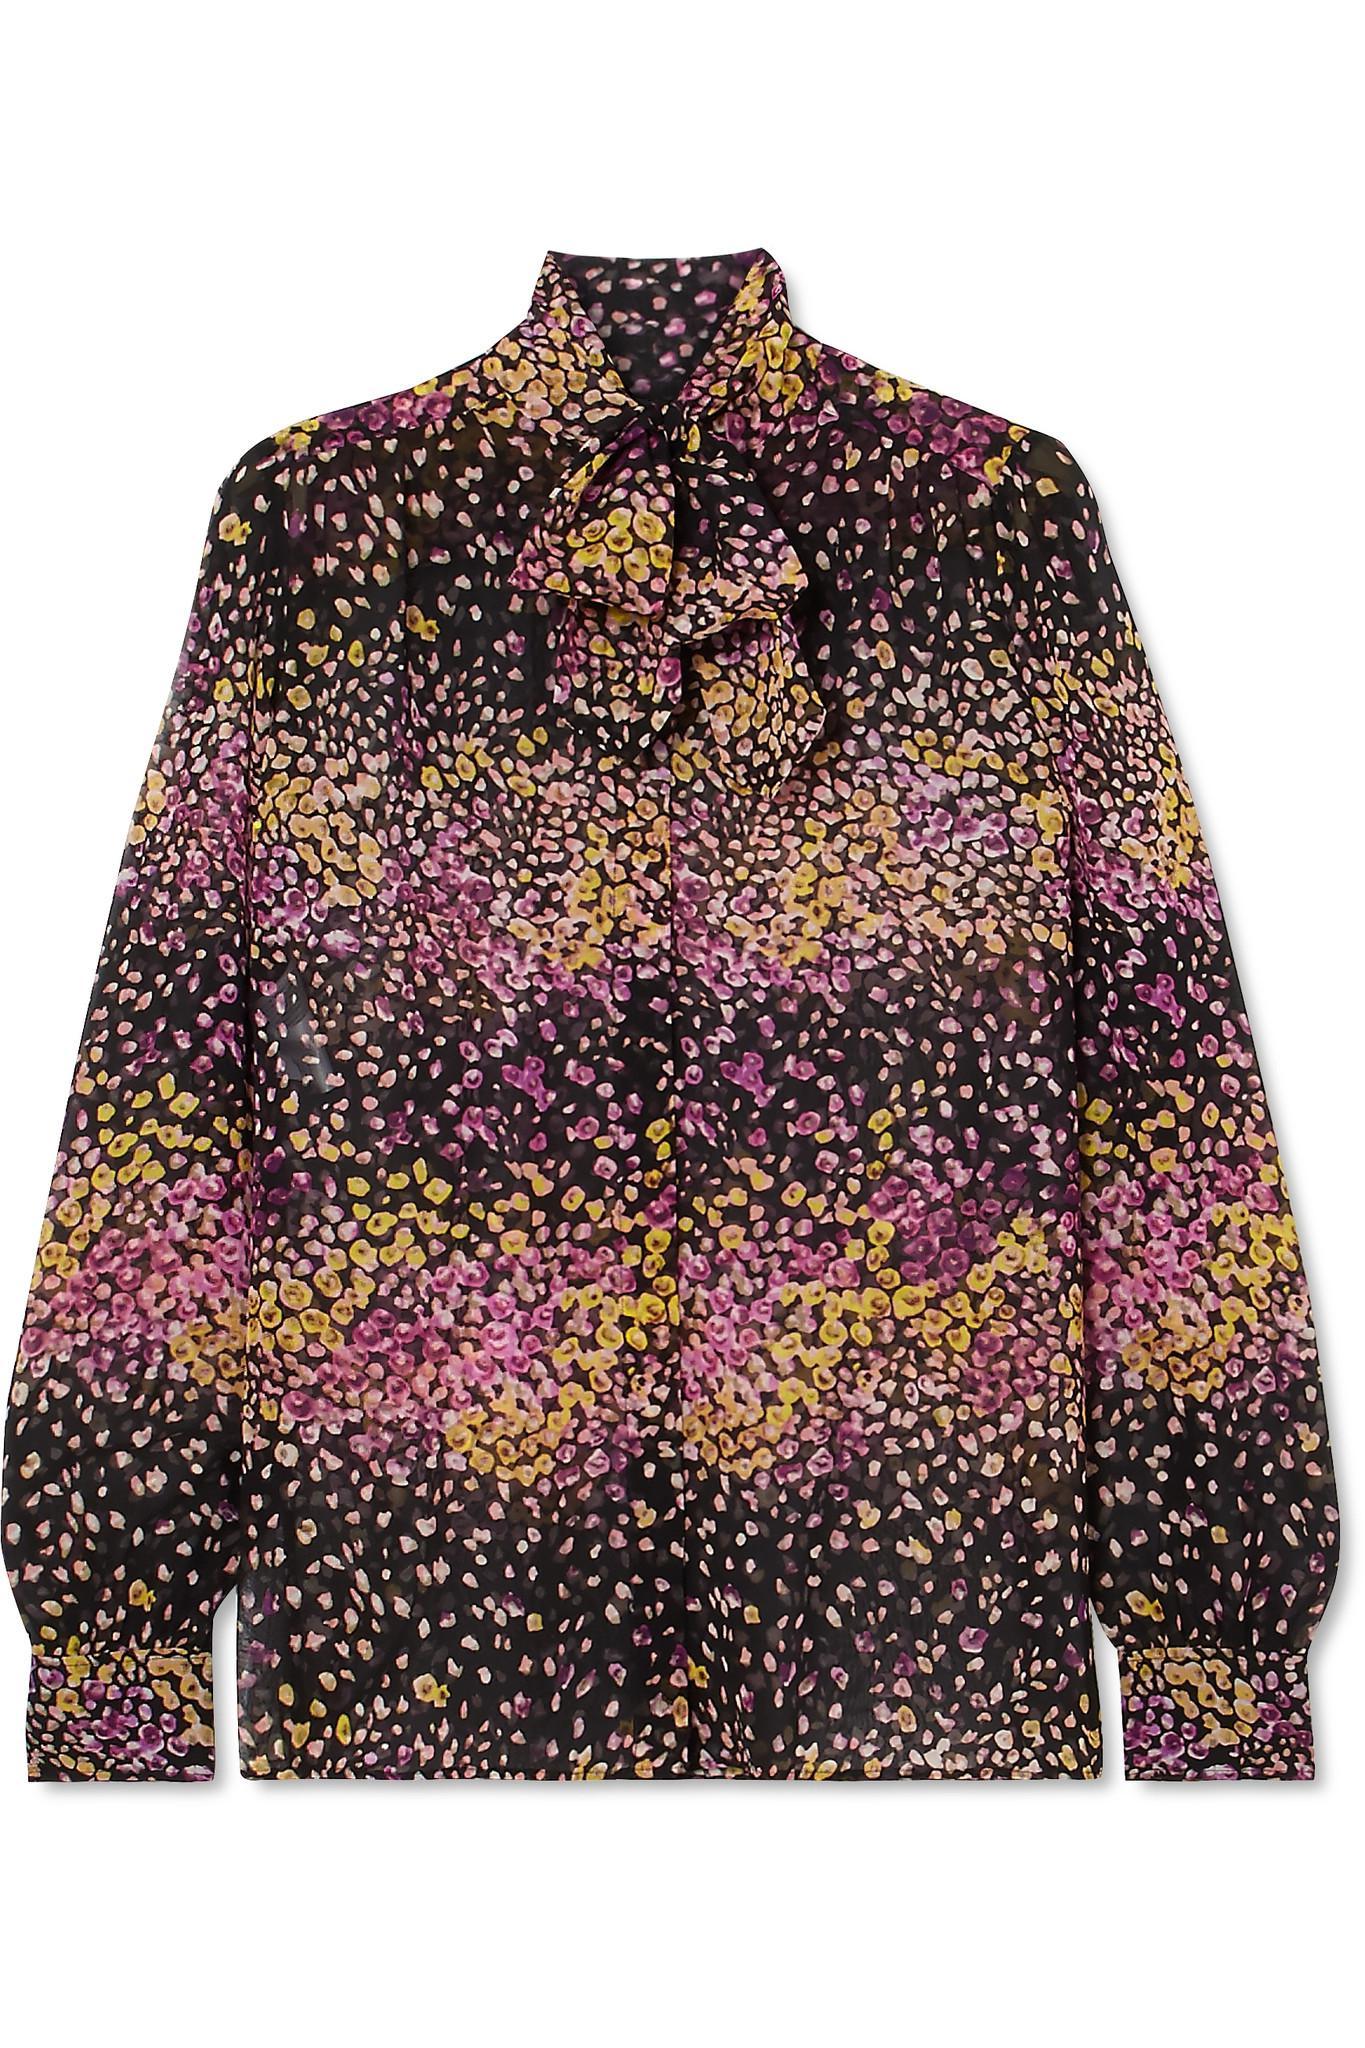 d870fcb2b88870 Giambattista Valli. Women's Black Pussy-bow Floral-print Silk-georgette  Blouse